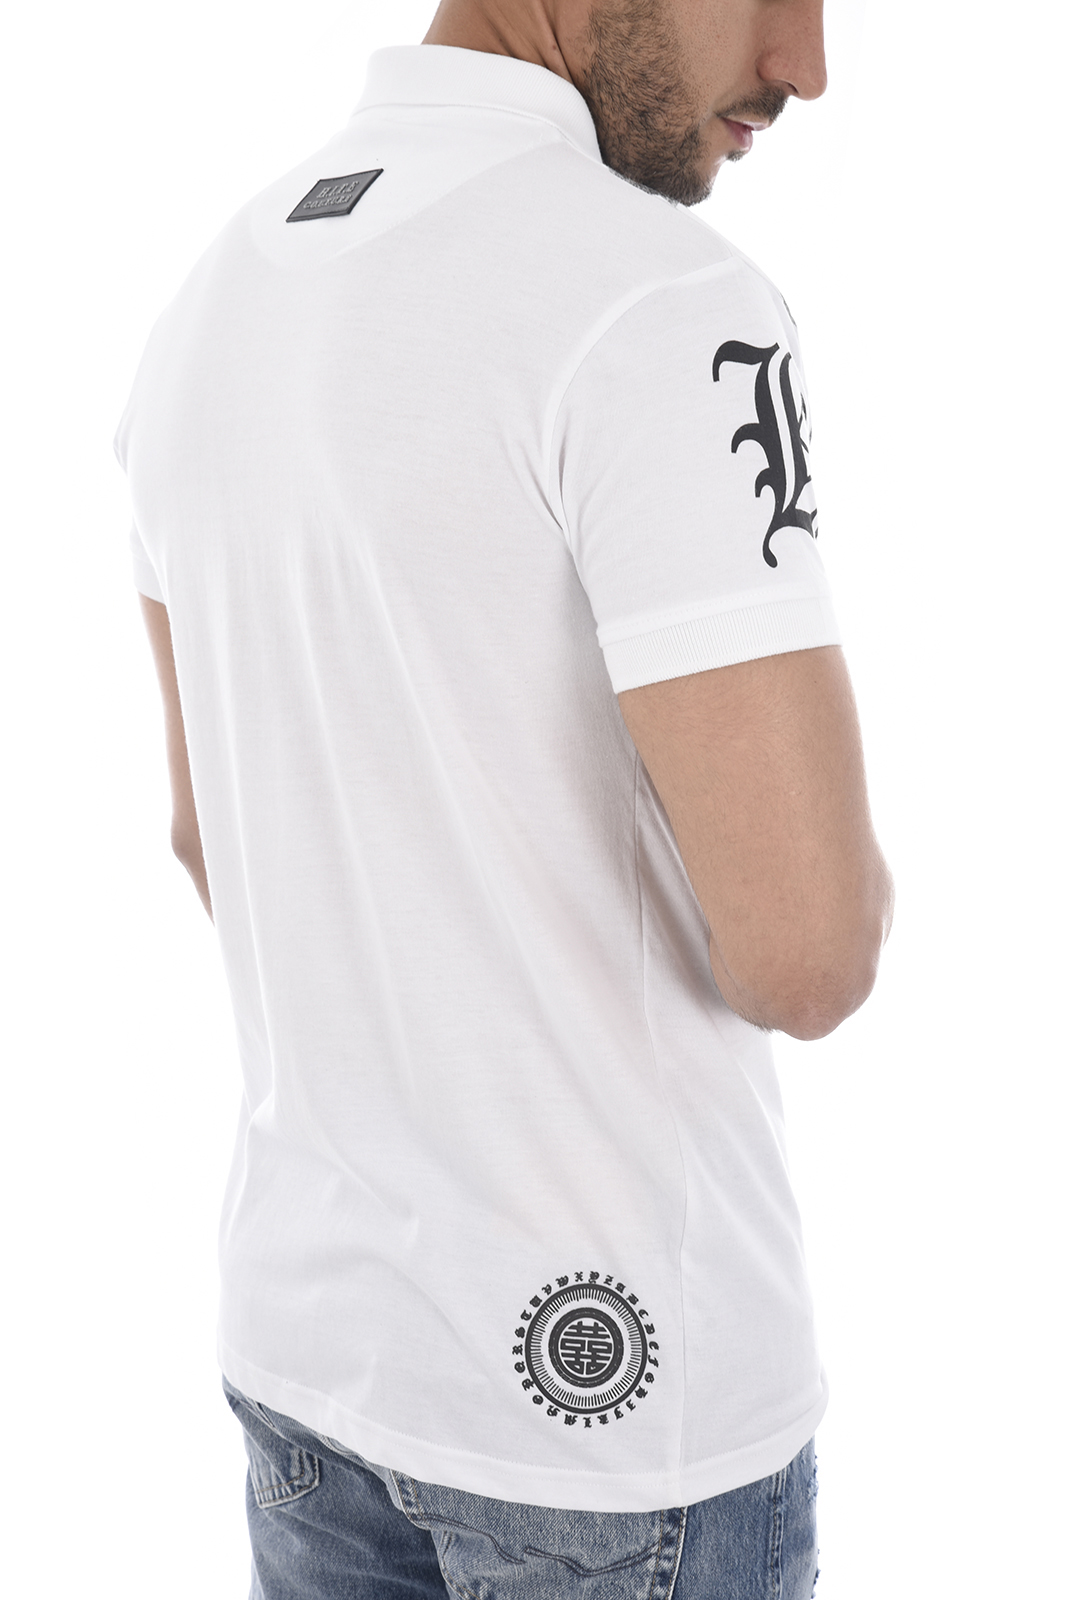 Tee-shirts  Hite couture PIVER BLANC